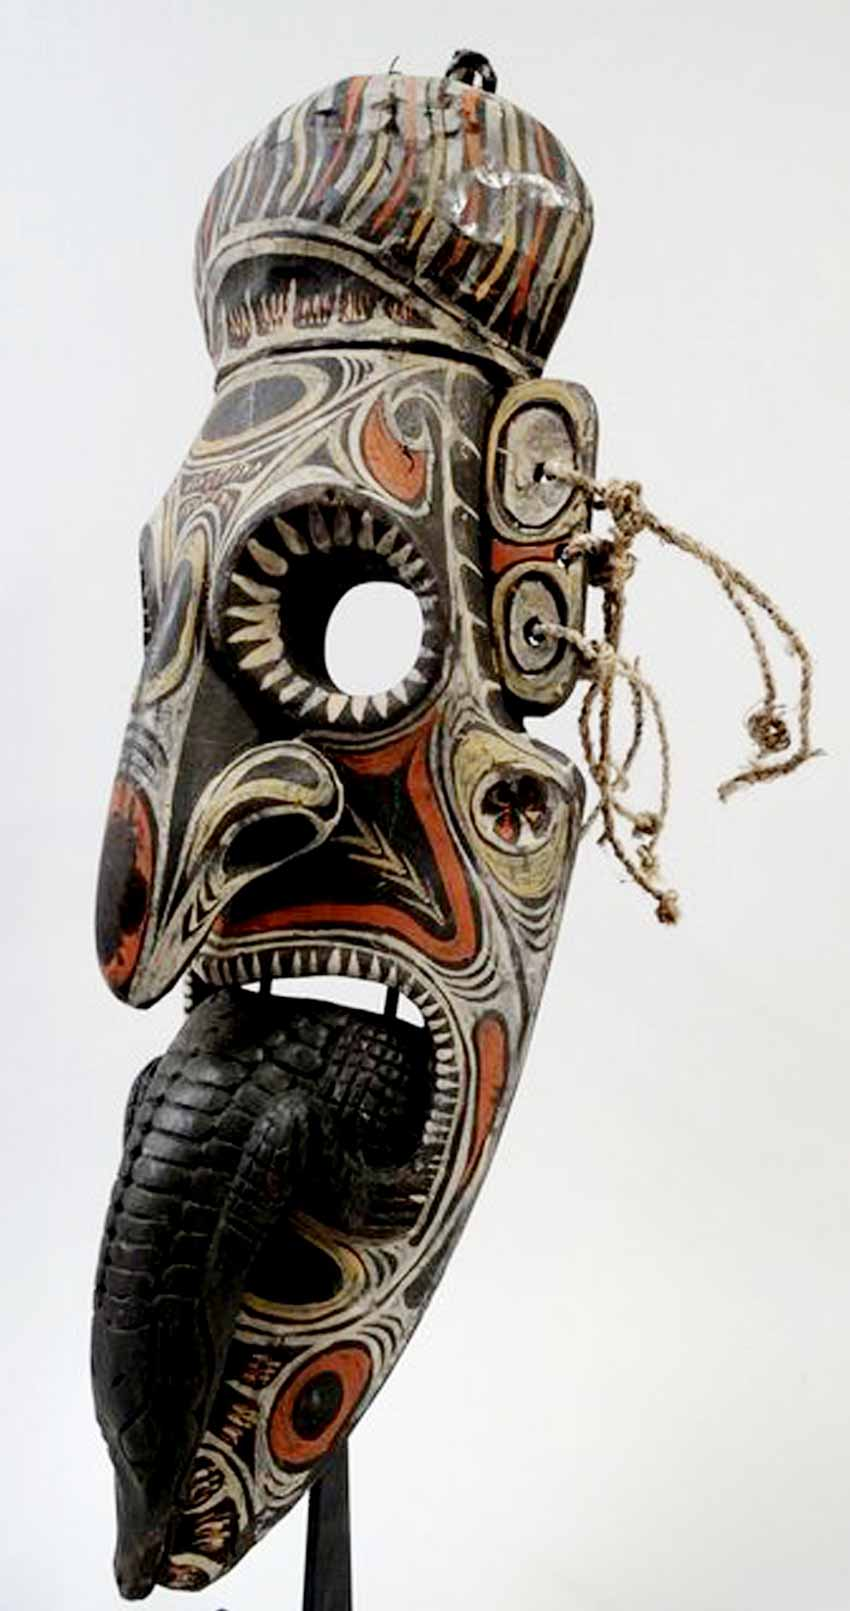 Phong phú mặt nạ Papua New Guinea - 19